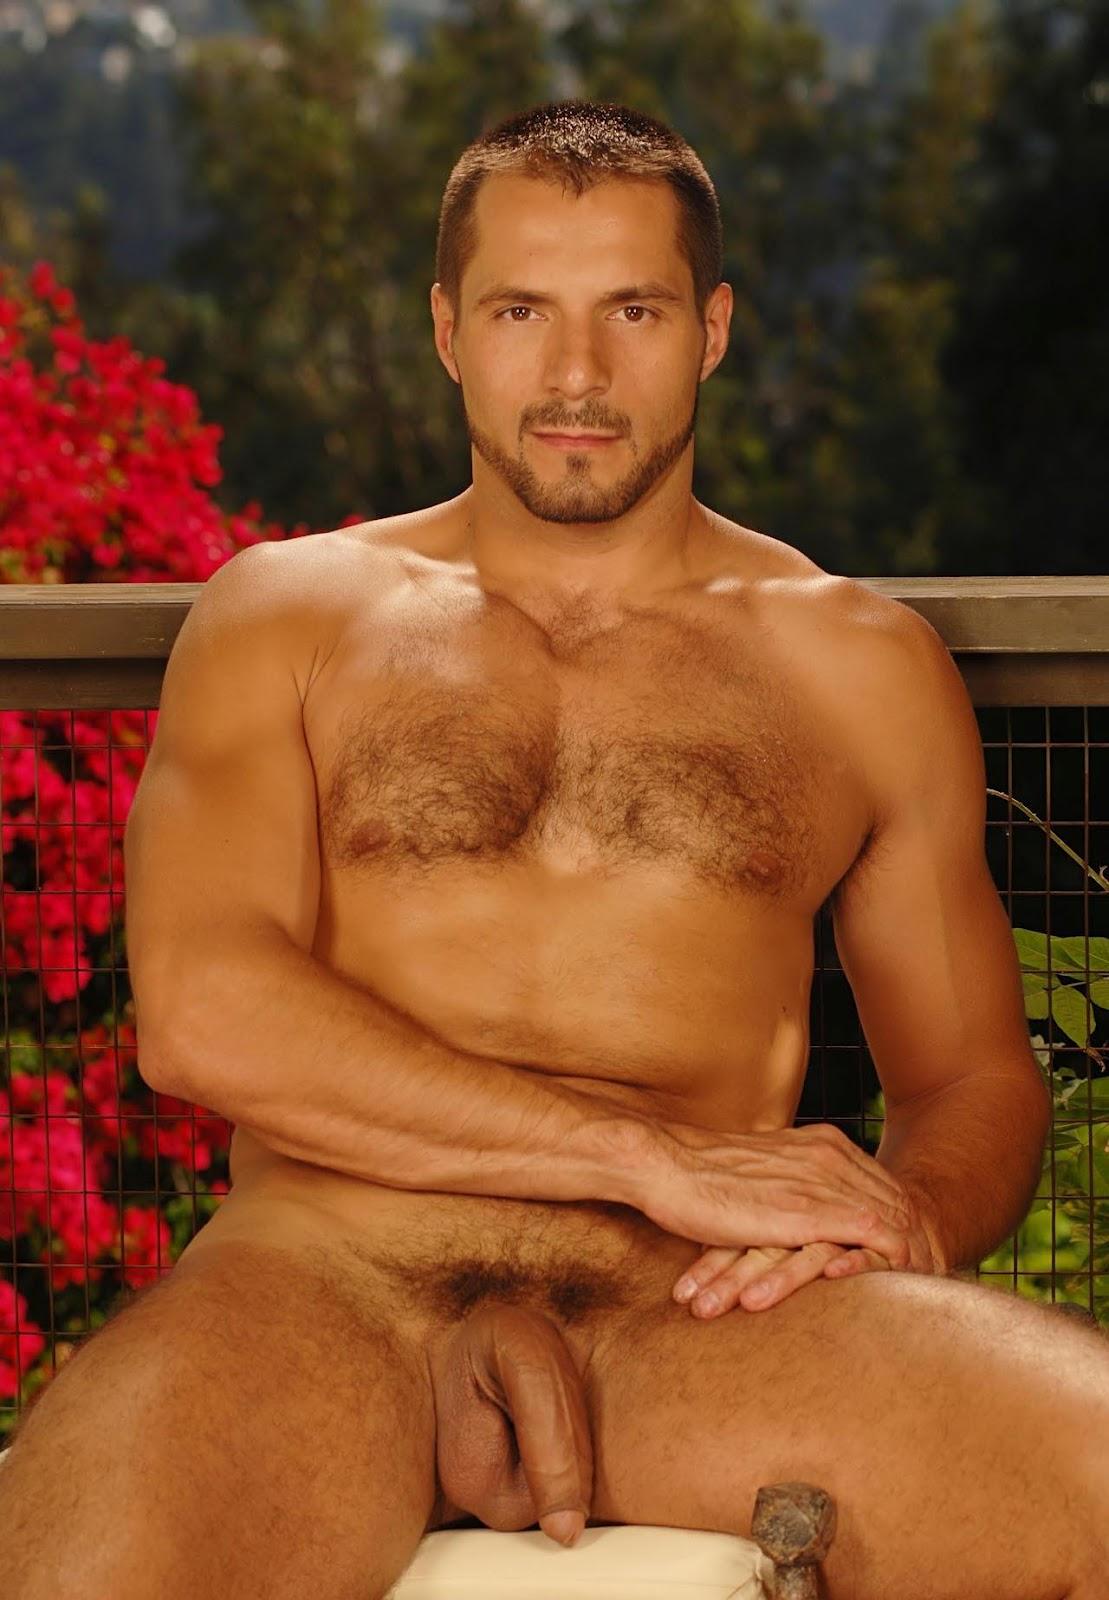 Must Love Men: Arpad Miklos: mostsexymen.blogspot.com/2012/03/arpad-miklos.html